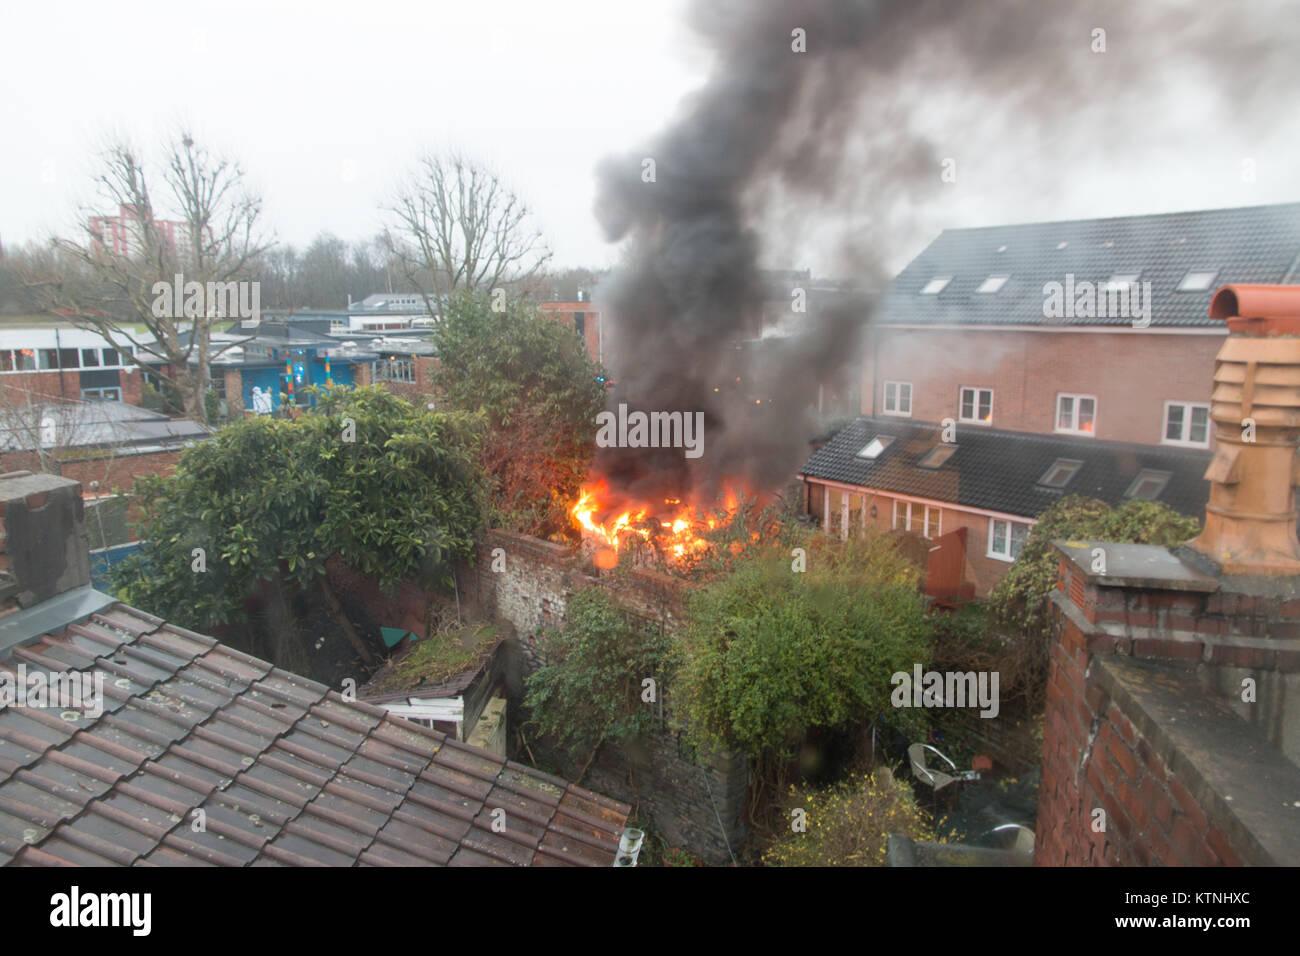 Bristol, UK. 26 December 2017.  An electric substation near Easton Church of England Academy set on fire around - Stock Image